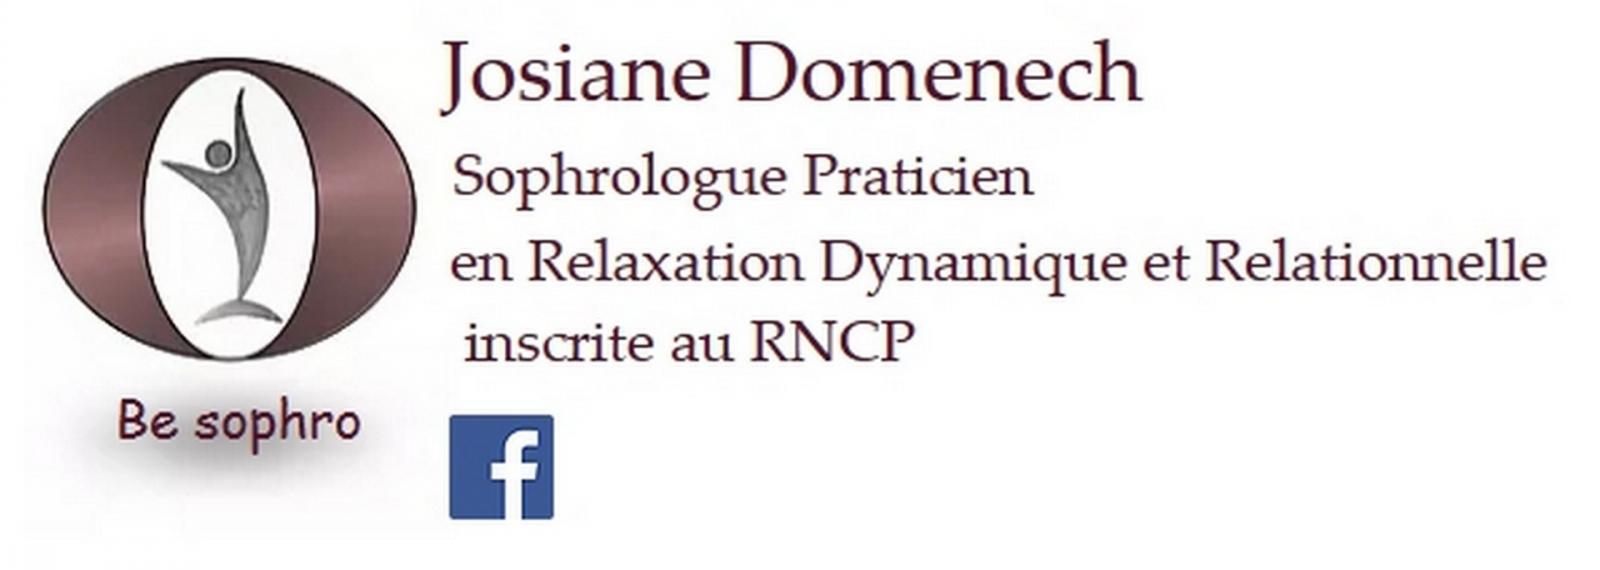 Josiane Domenech Sophrologue